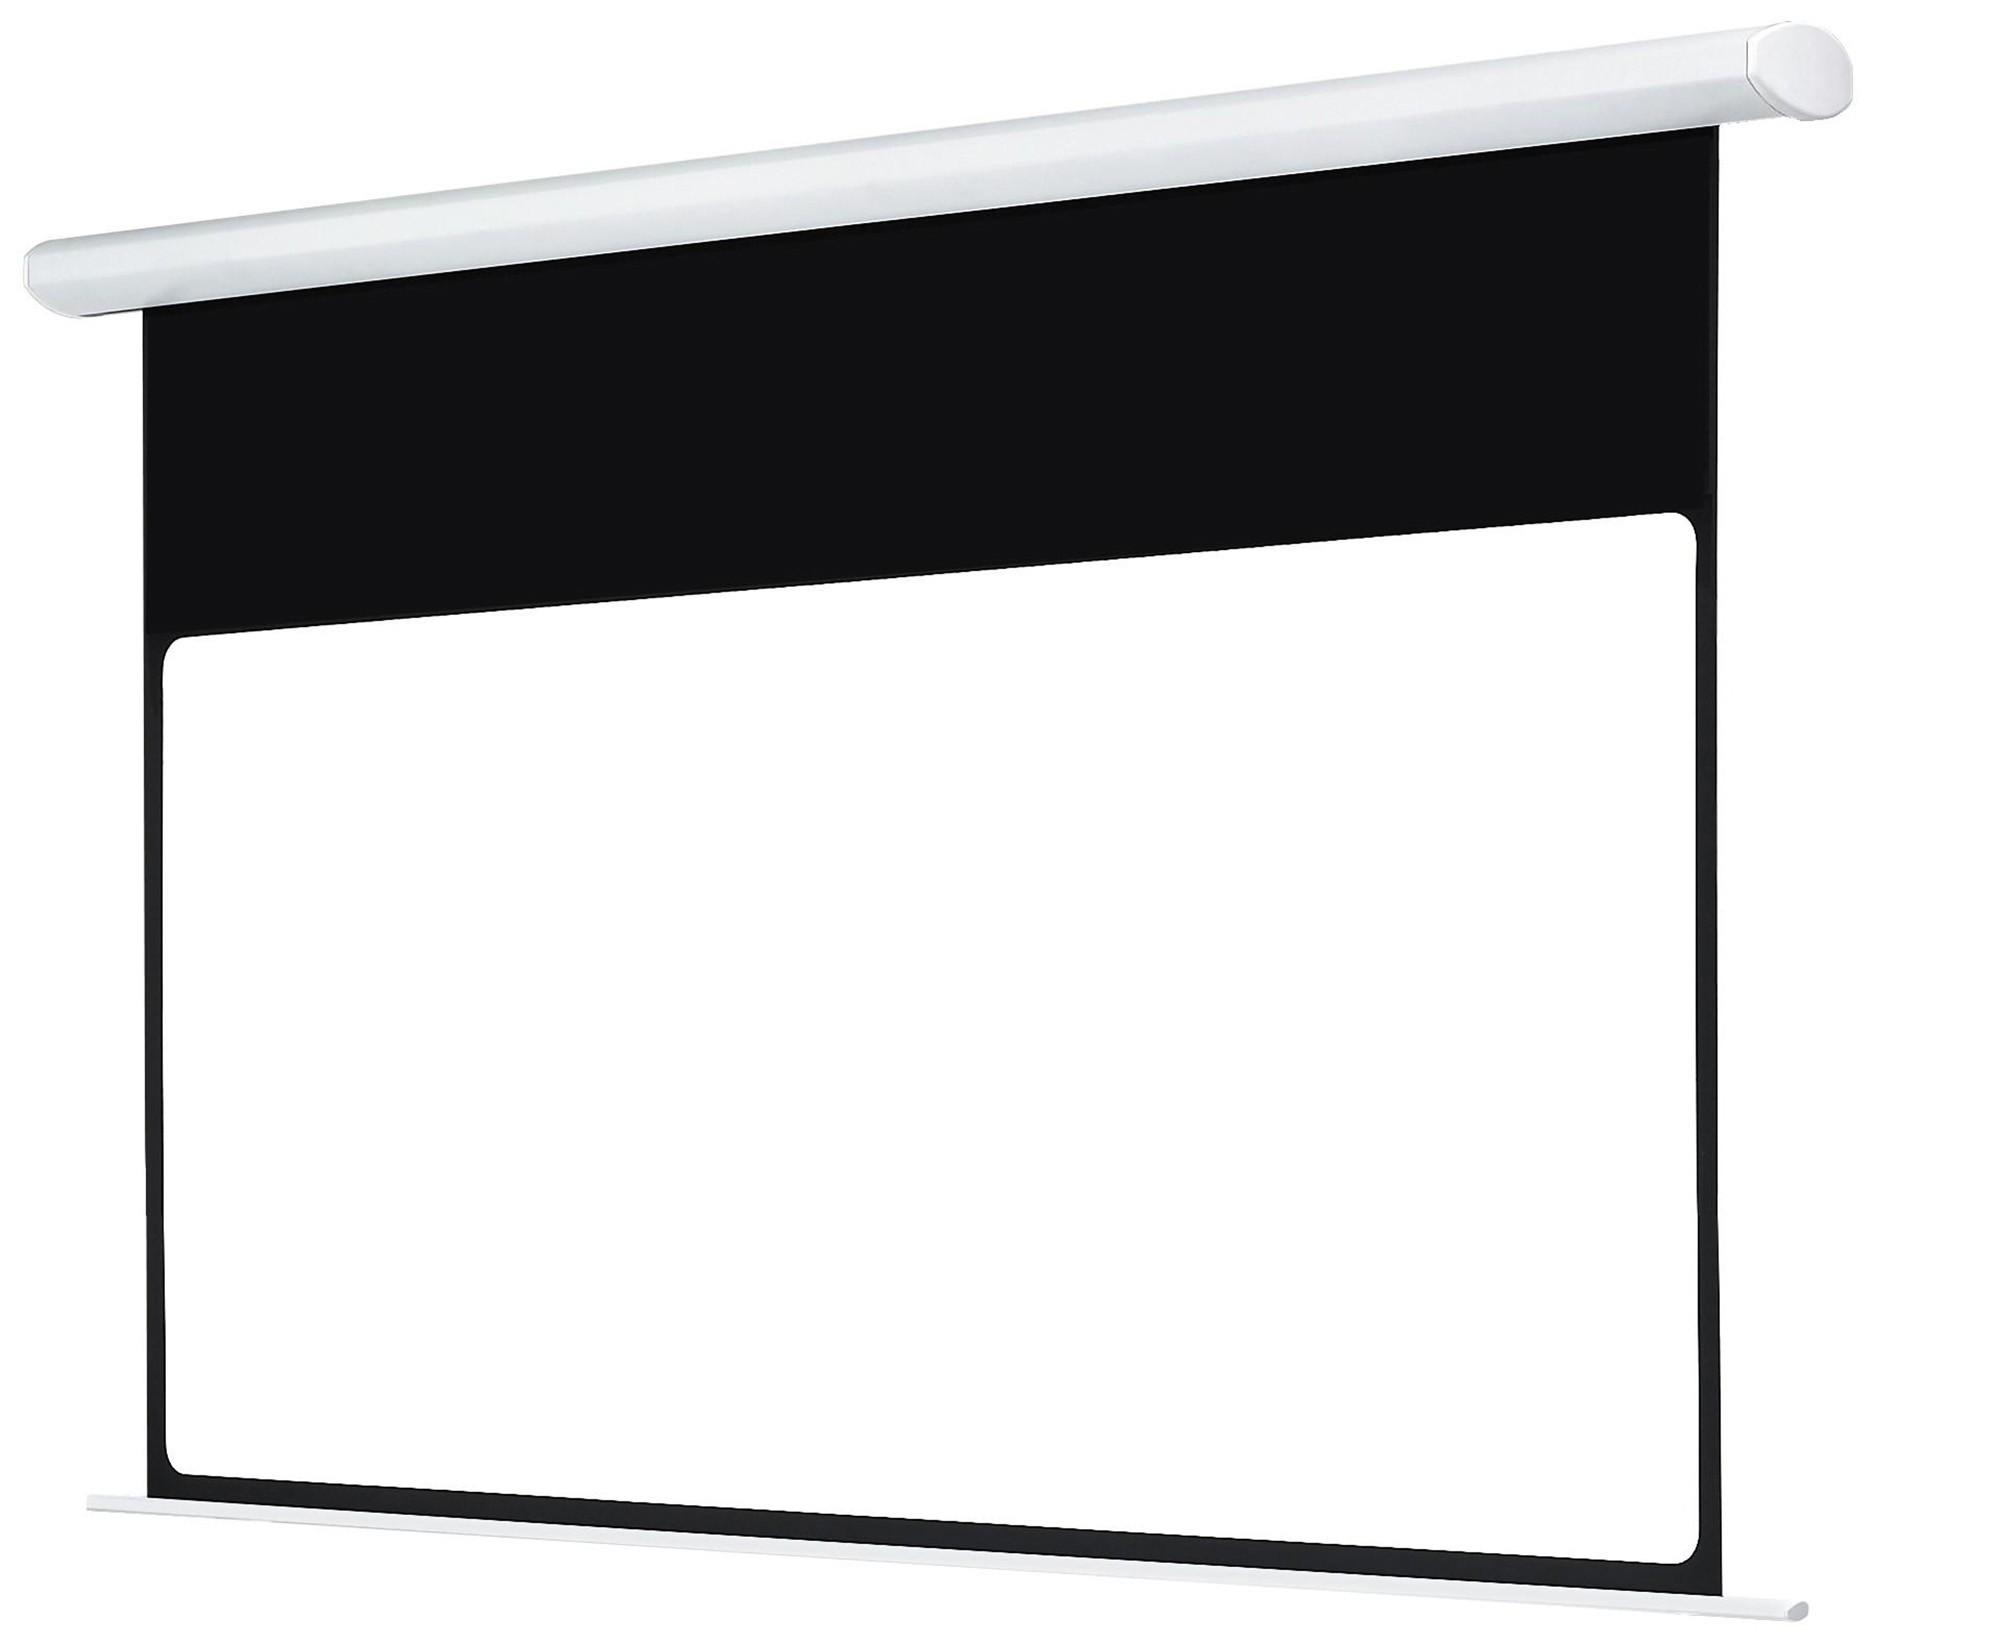 ecran de projection motoris oray hcm4 130x232 infrarouge. Black Bedroom Furniture Sets. Home Design Ideas